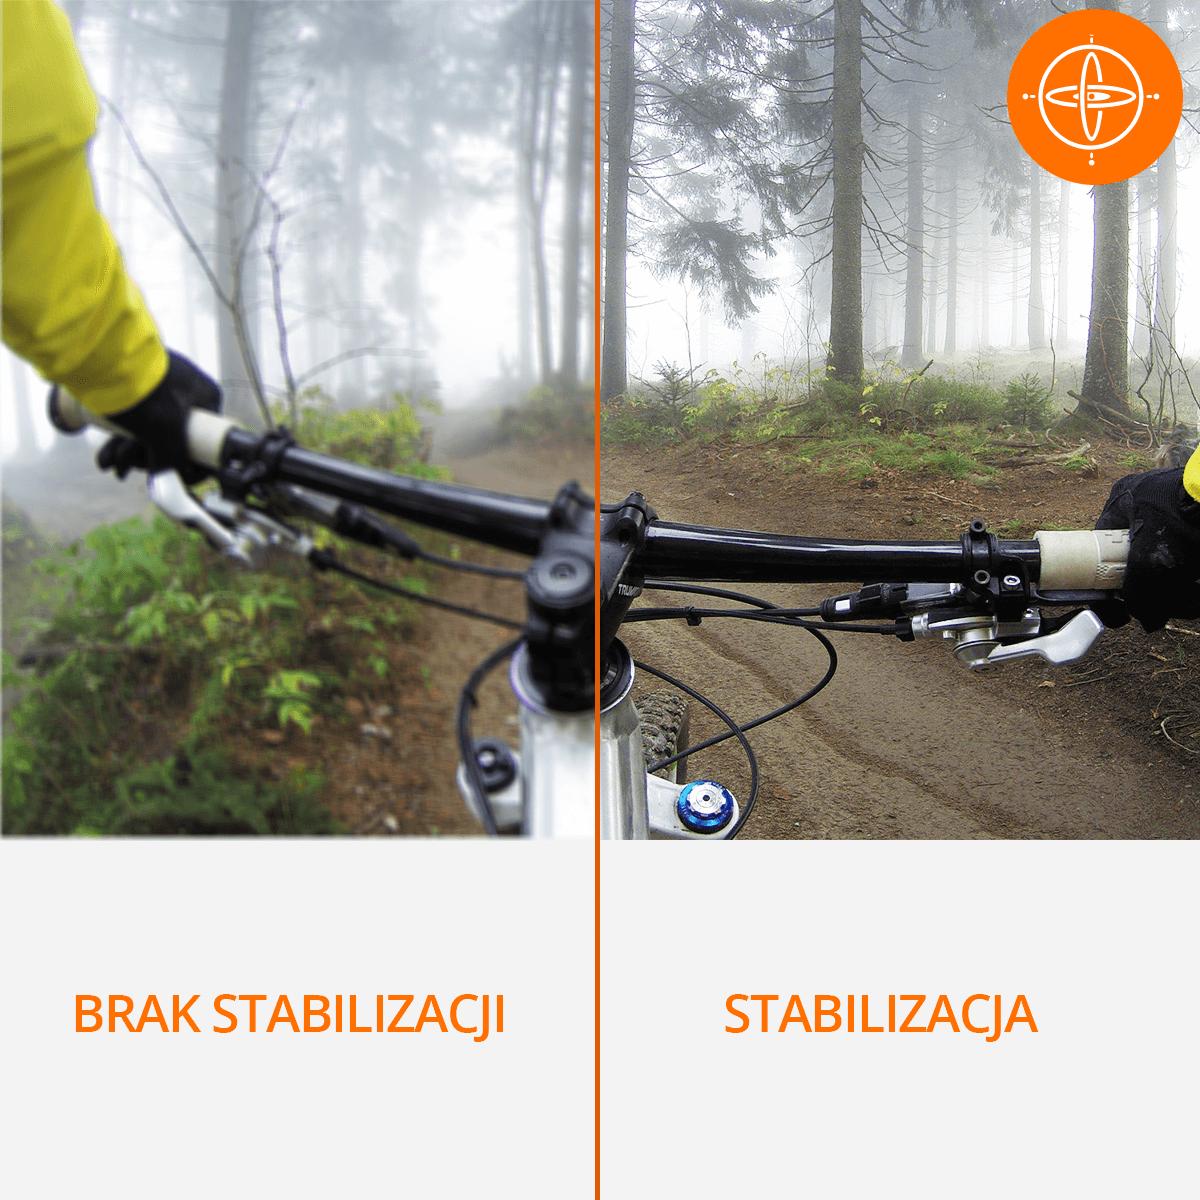 kamera na rower ze stabilizacja obrazu orllo sklep cena